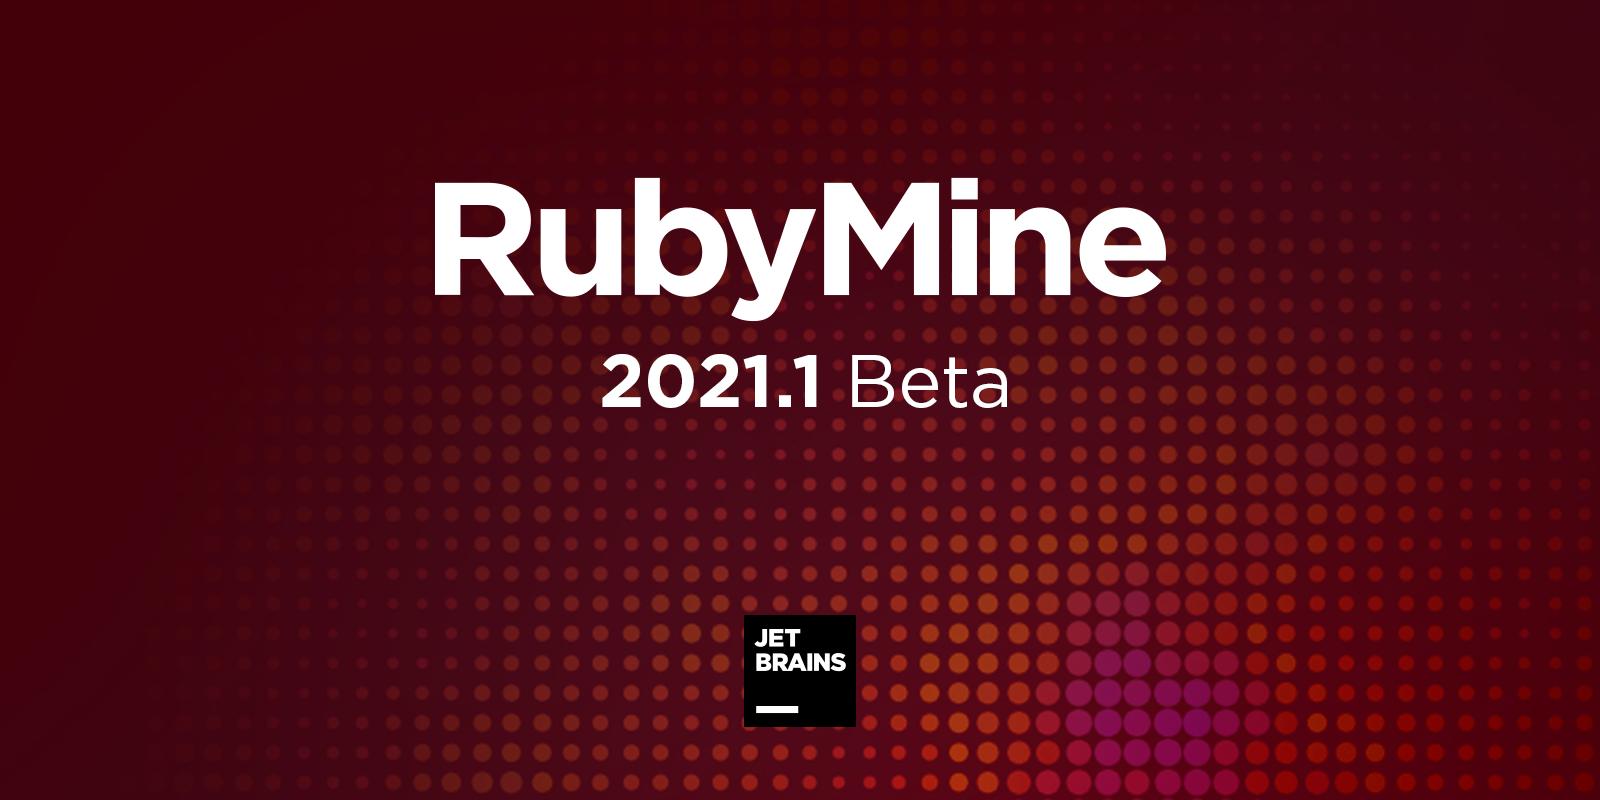 RubyMine 2021.1. Beta